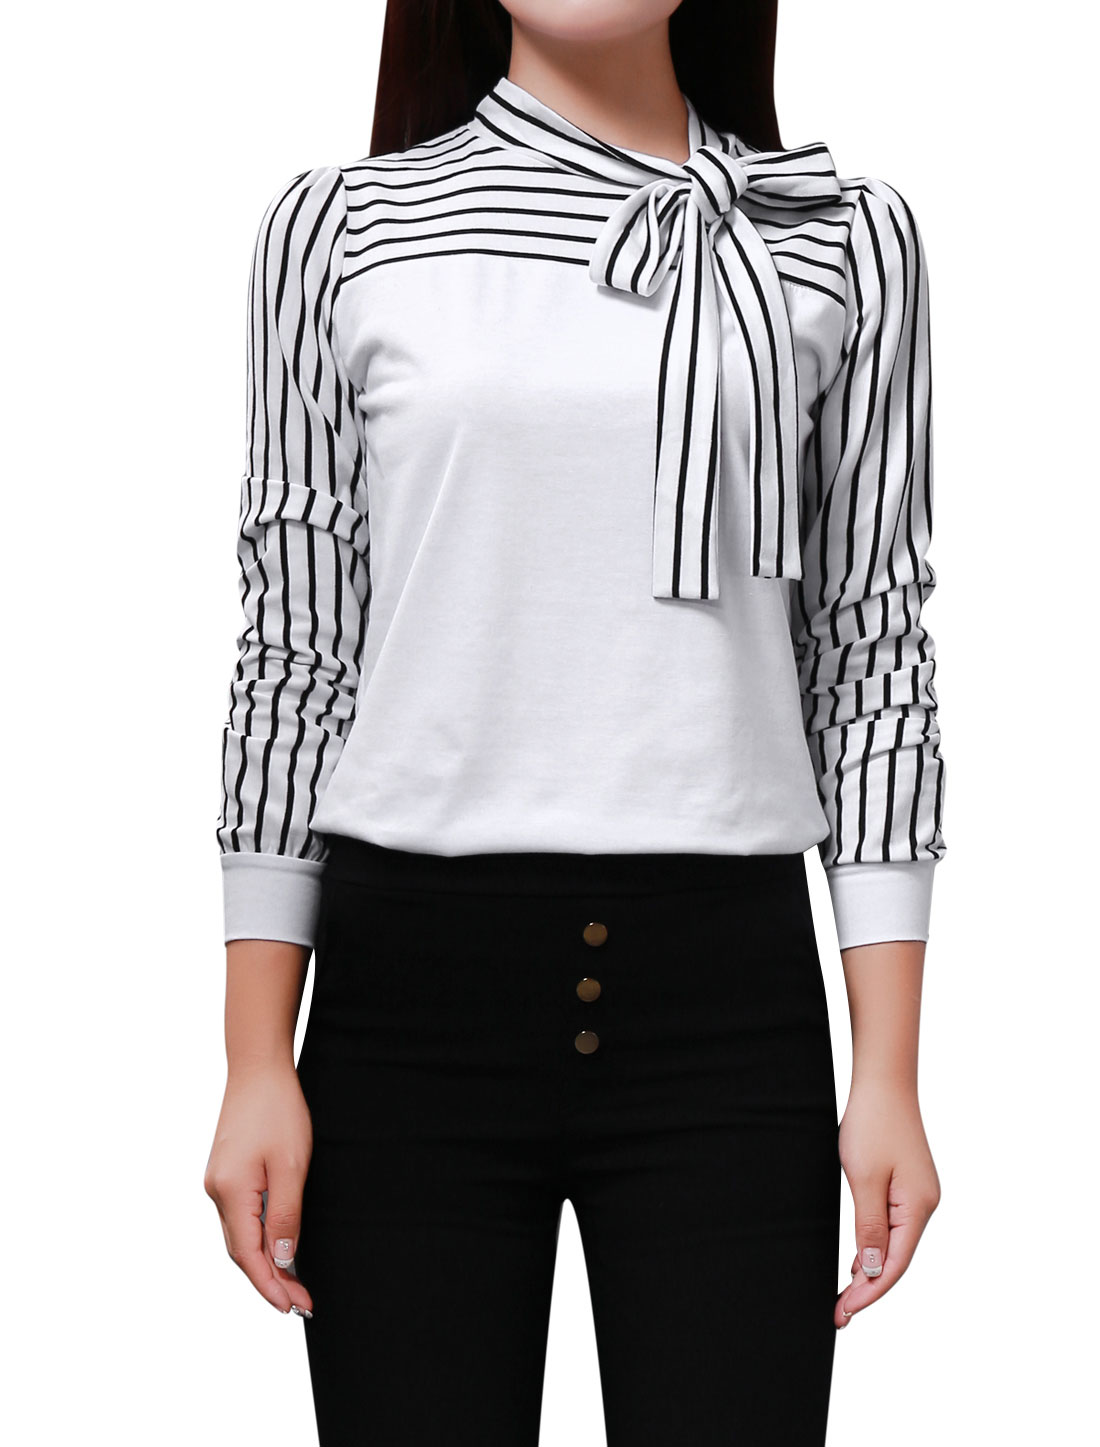 Women White Striped Sleeve Knot Neck Autumn Shirt Top M